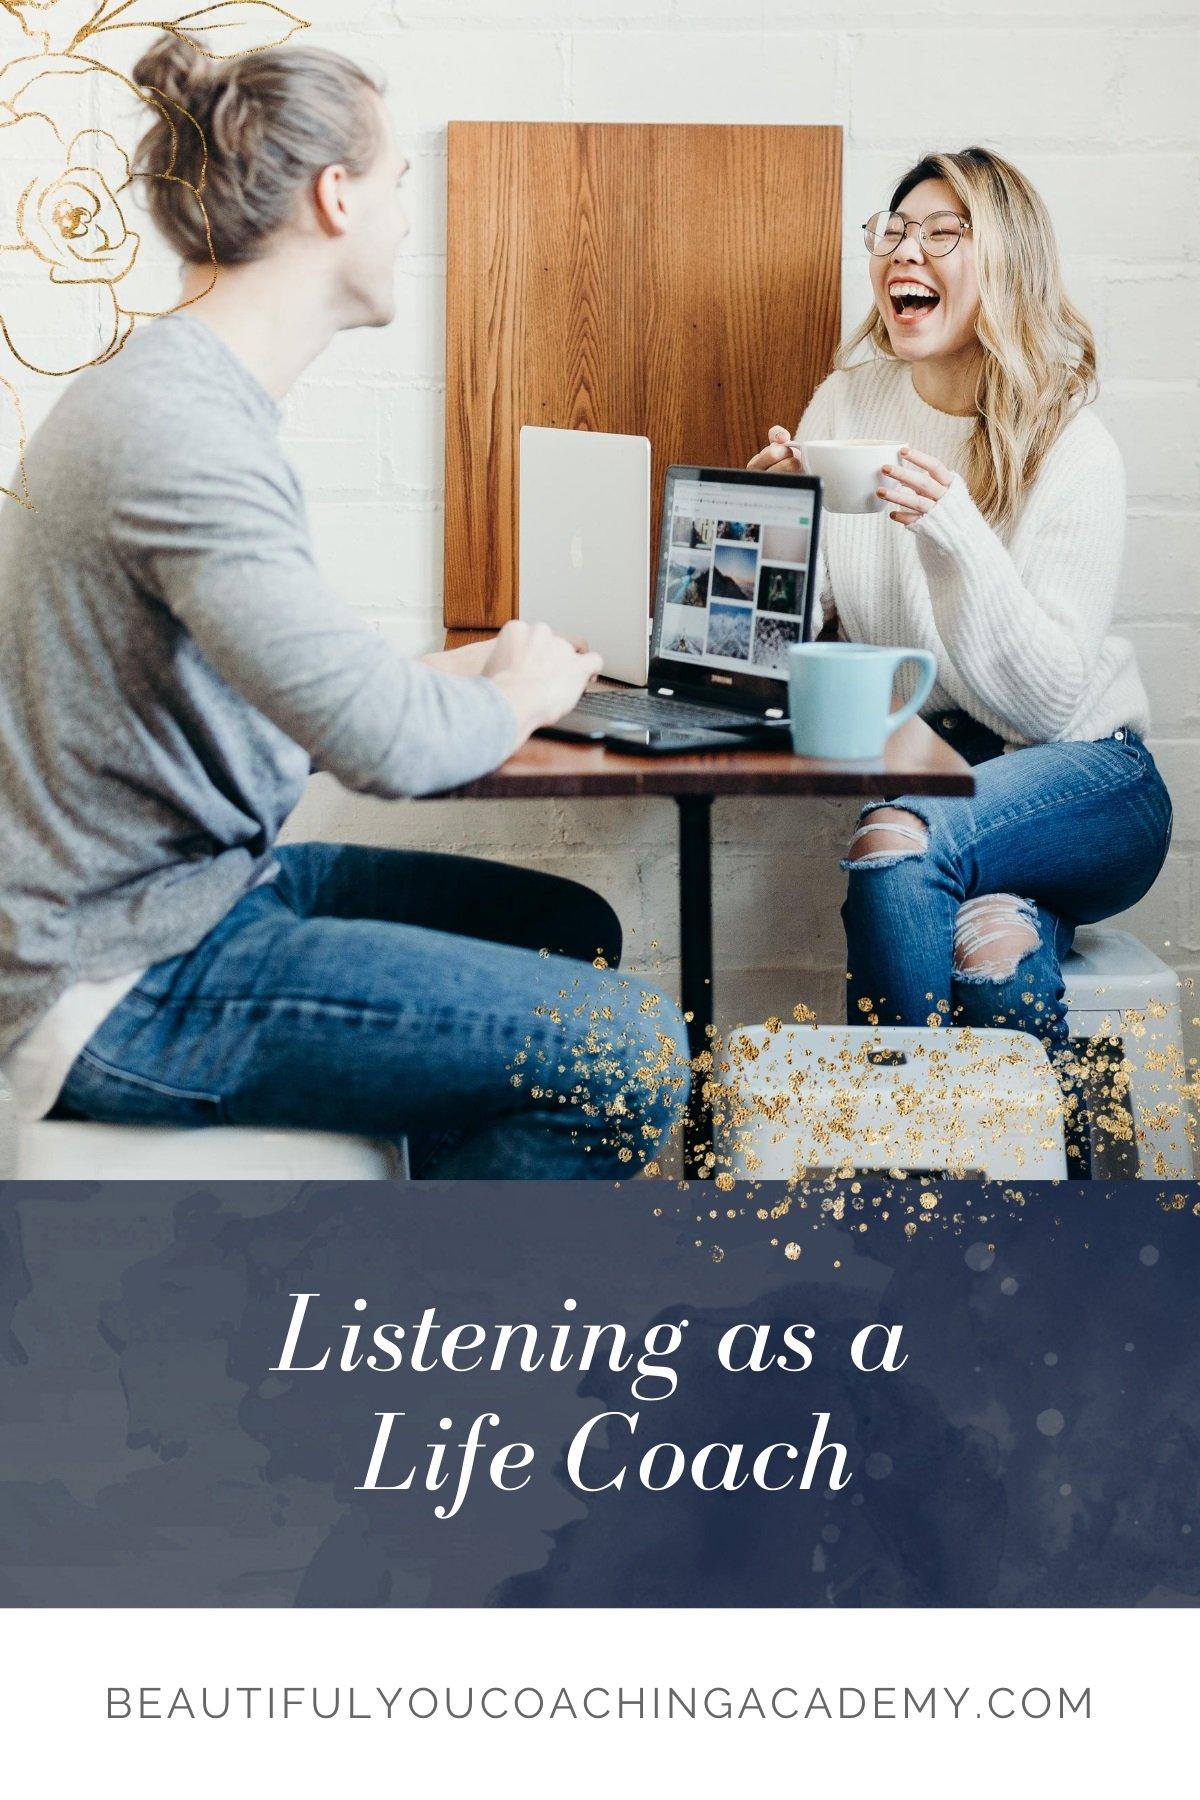 Listening as a Life Coach